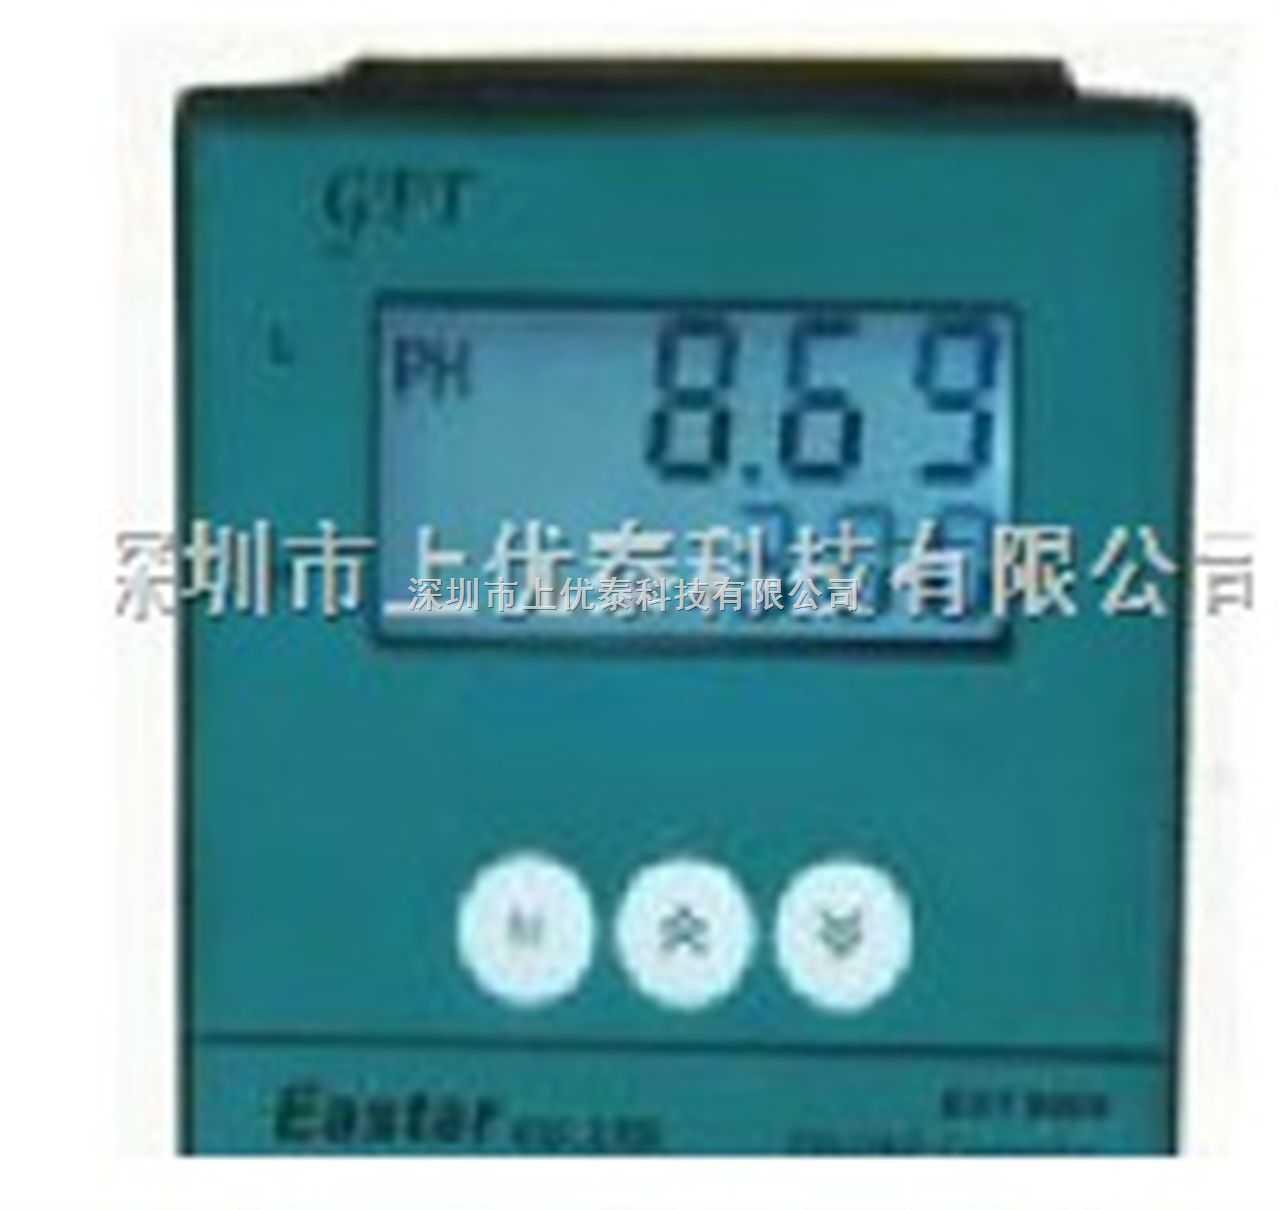 PH仪表,EST9000系列PH表